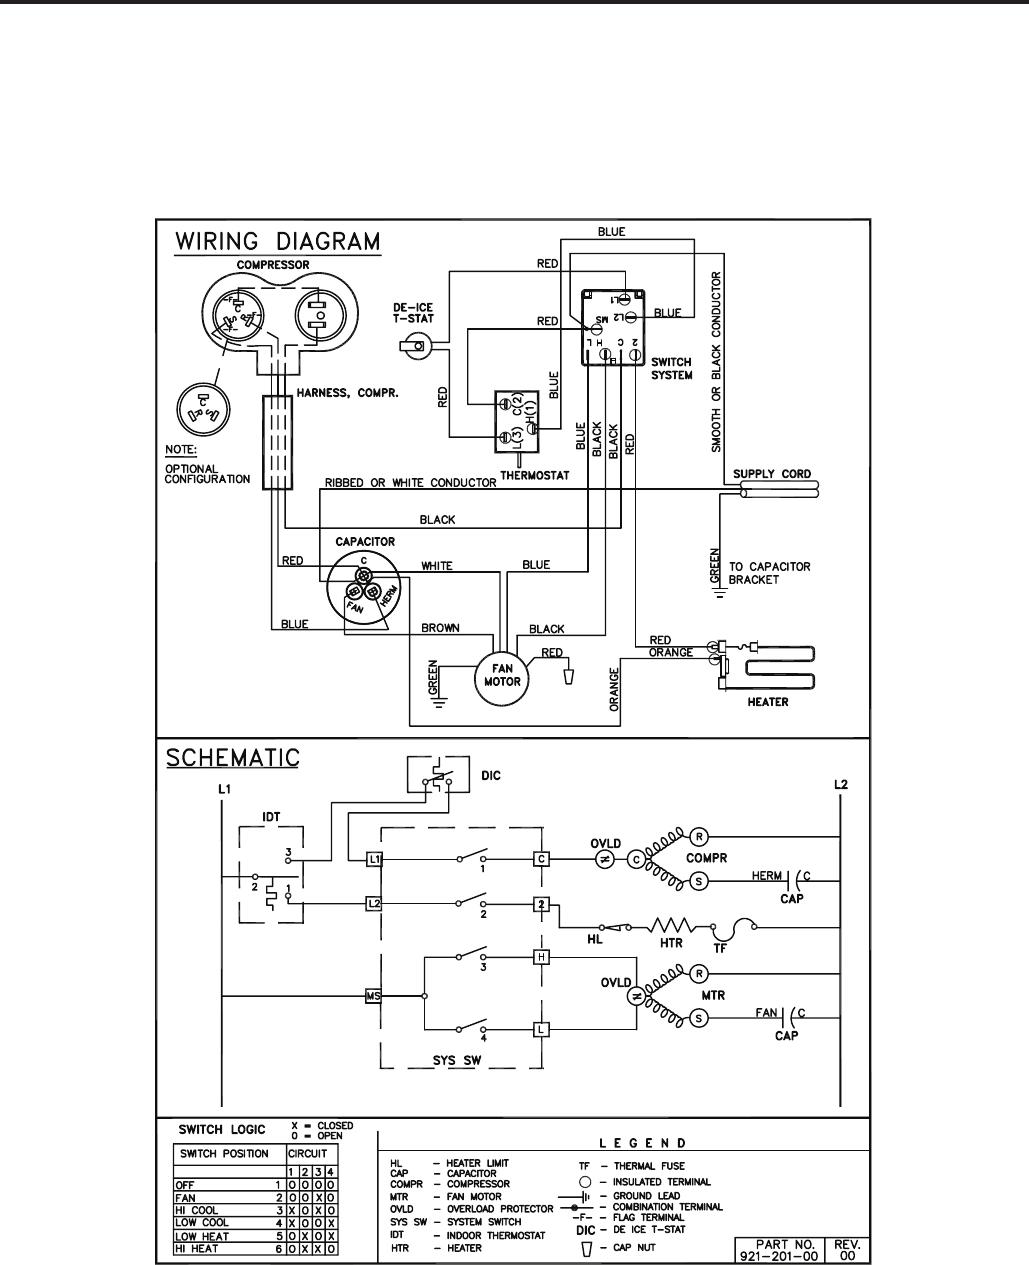 Friedrich Quietmaster 2009 Users Manual P2kpd 1 05 The 25l Motor Data Sensor Heating Oxygen Circuit Diagram Of Electromechanical Control